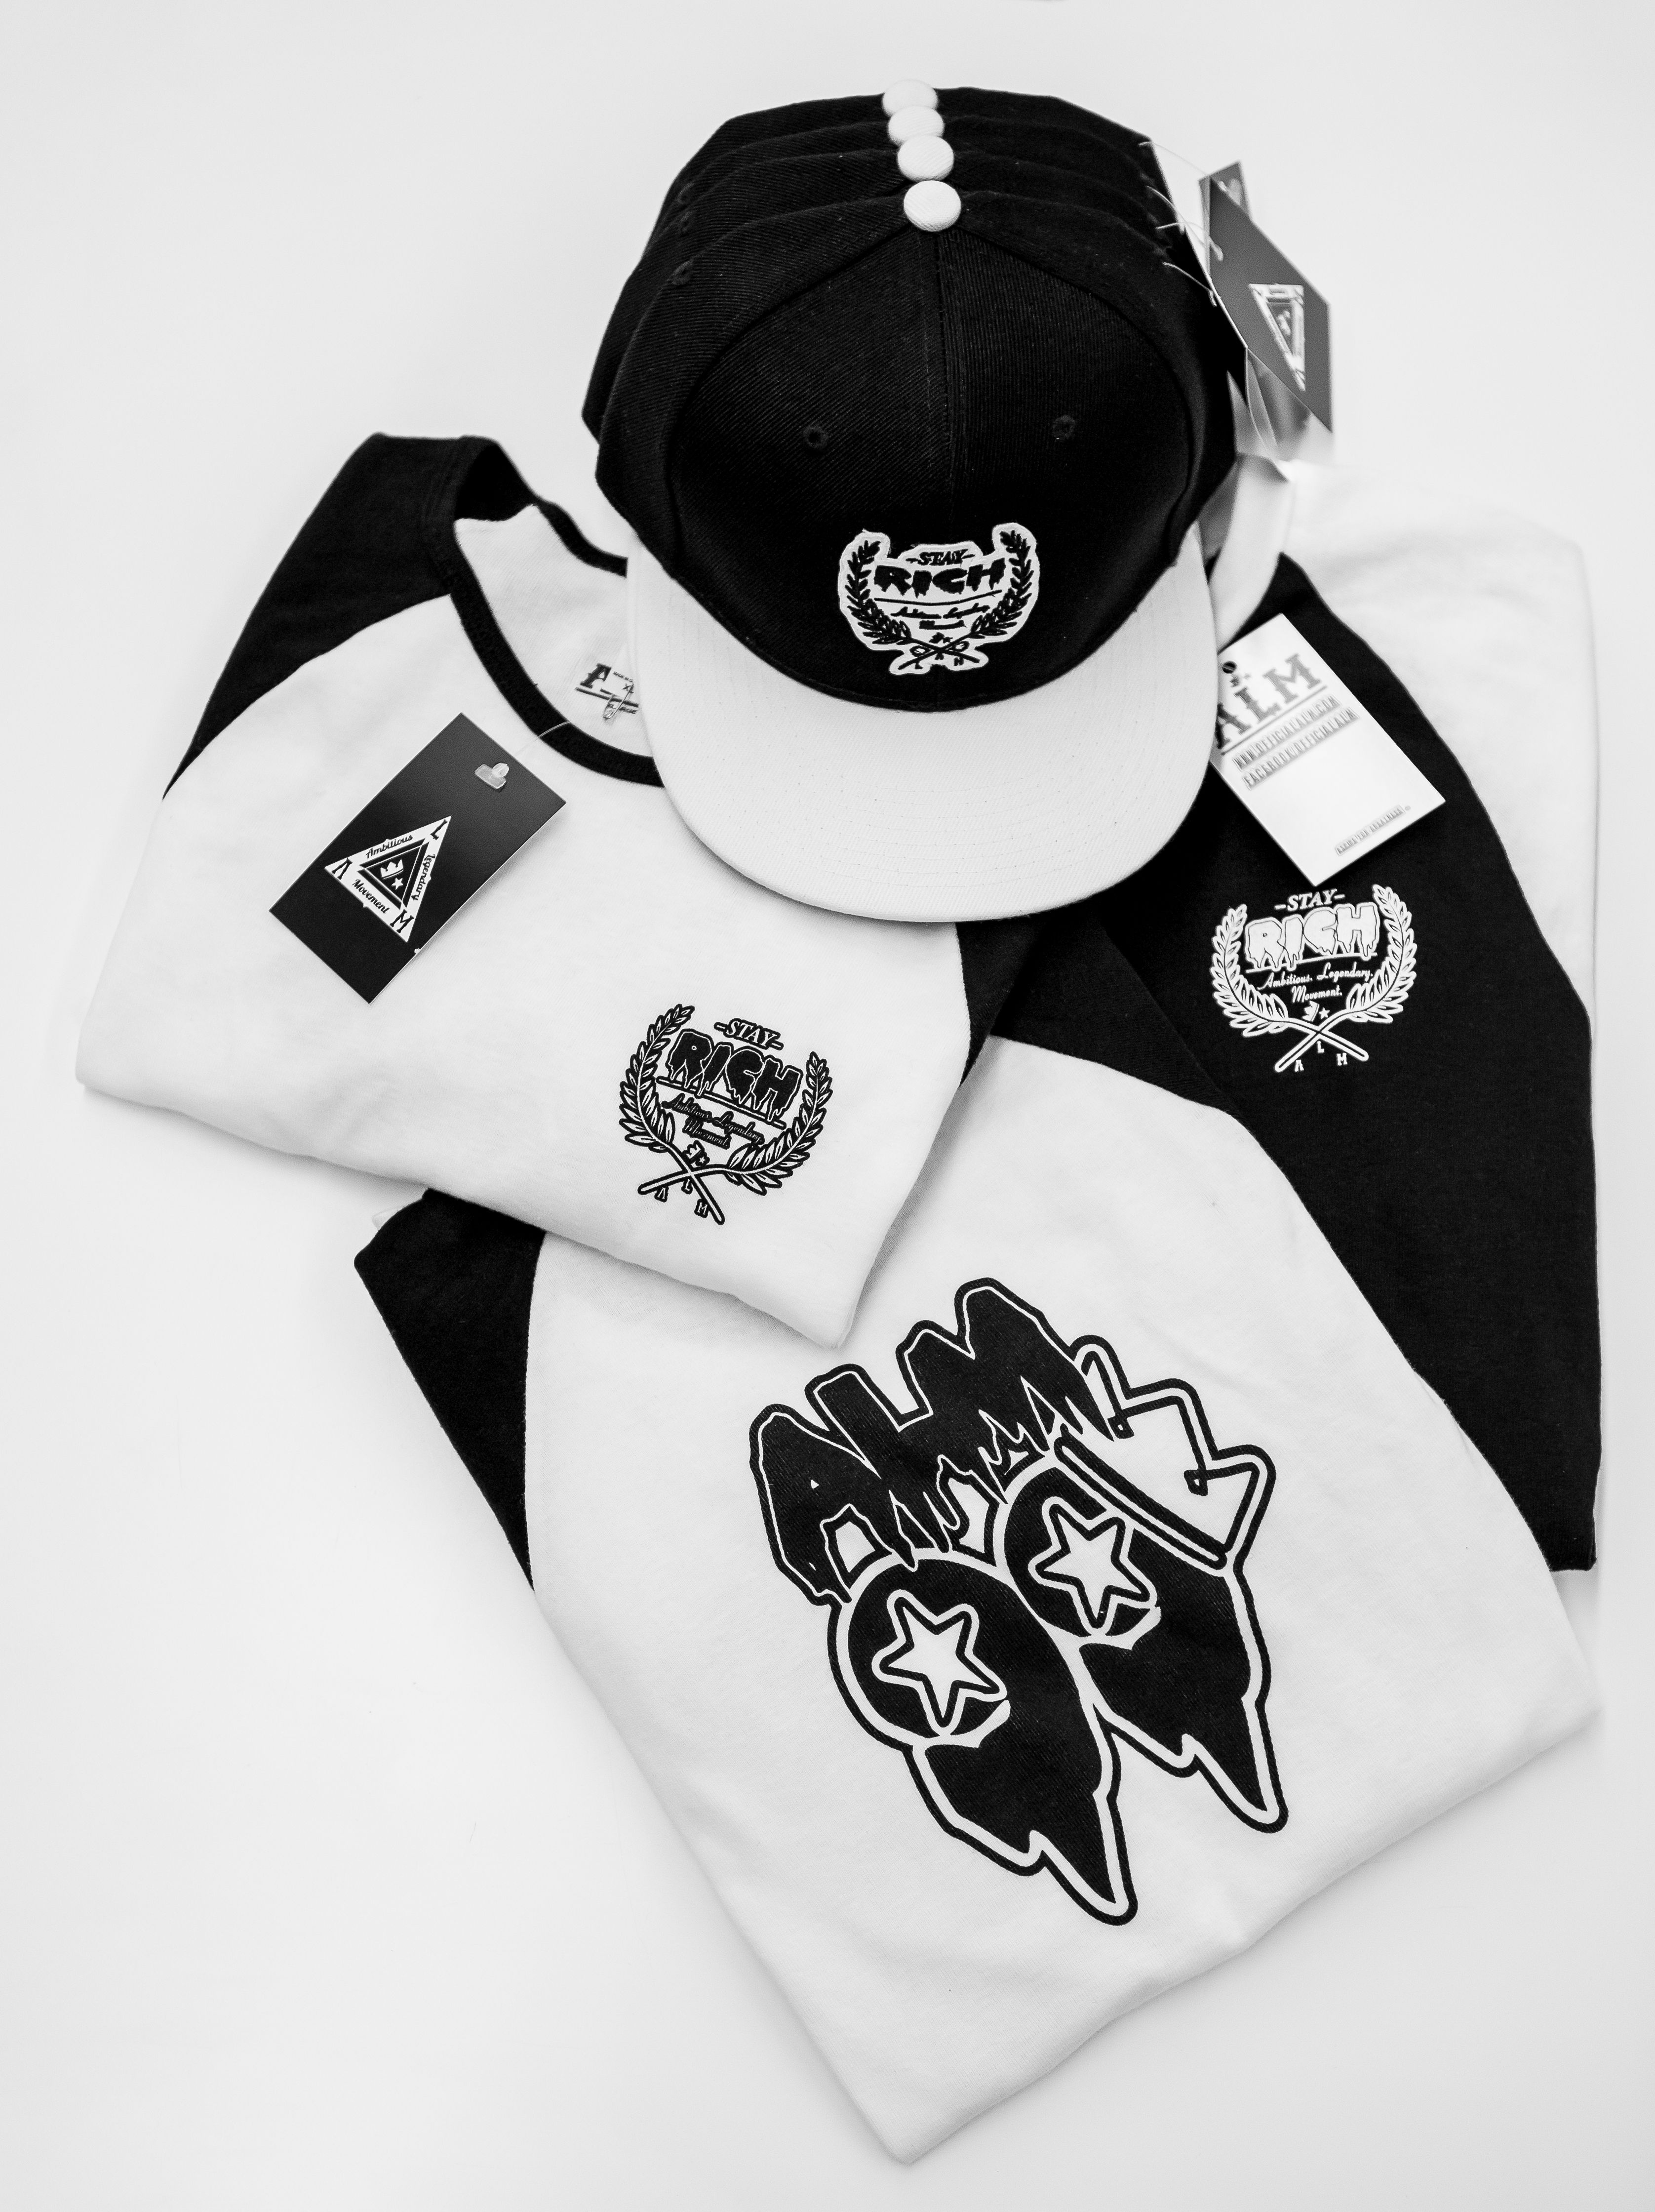 ALM BLACK TRILL EDITION BLACK AN WHITE 3/4 BASE BALL SHIRT $22  SNAP BACK $25 #LAfresh1 #officialalm www.officialalm.com www.facebook/officialalm.com